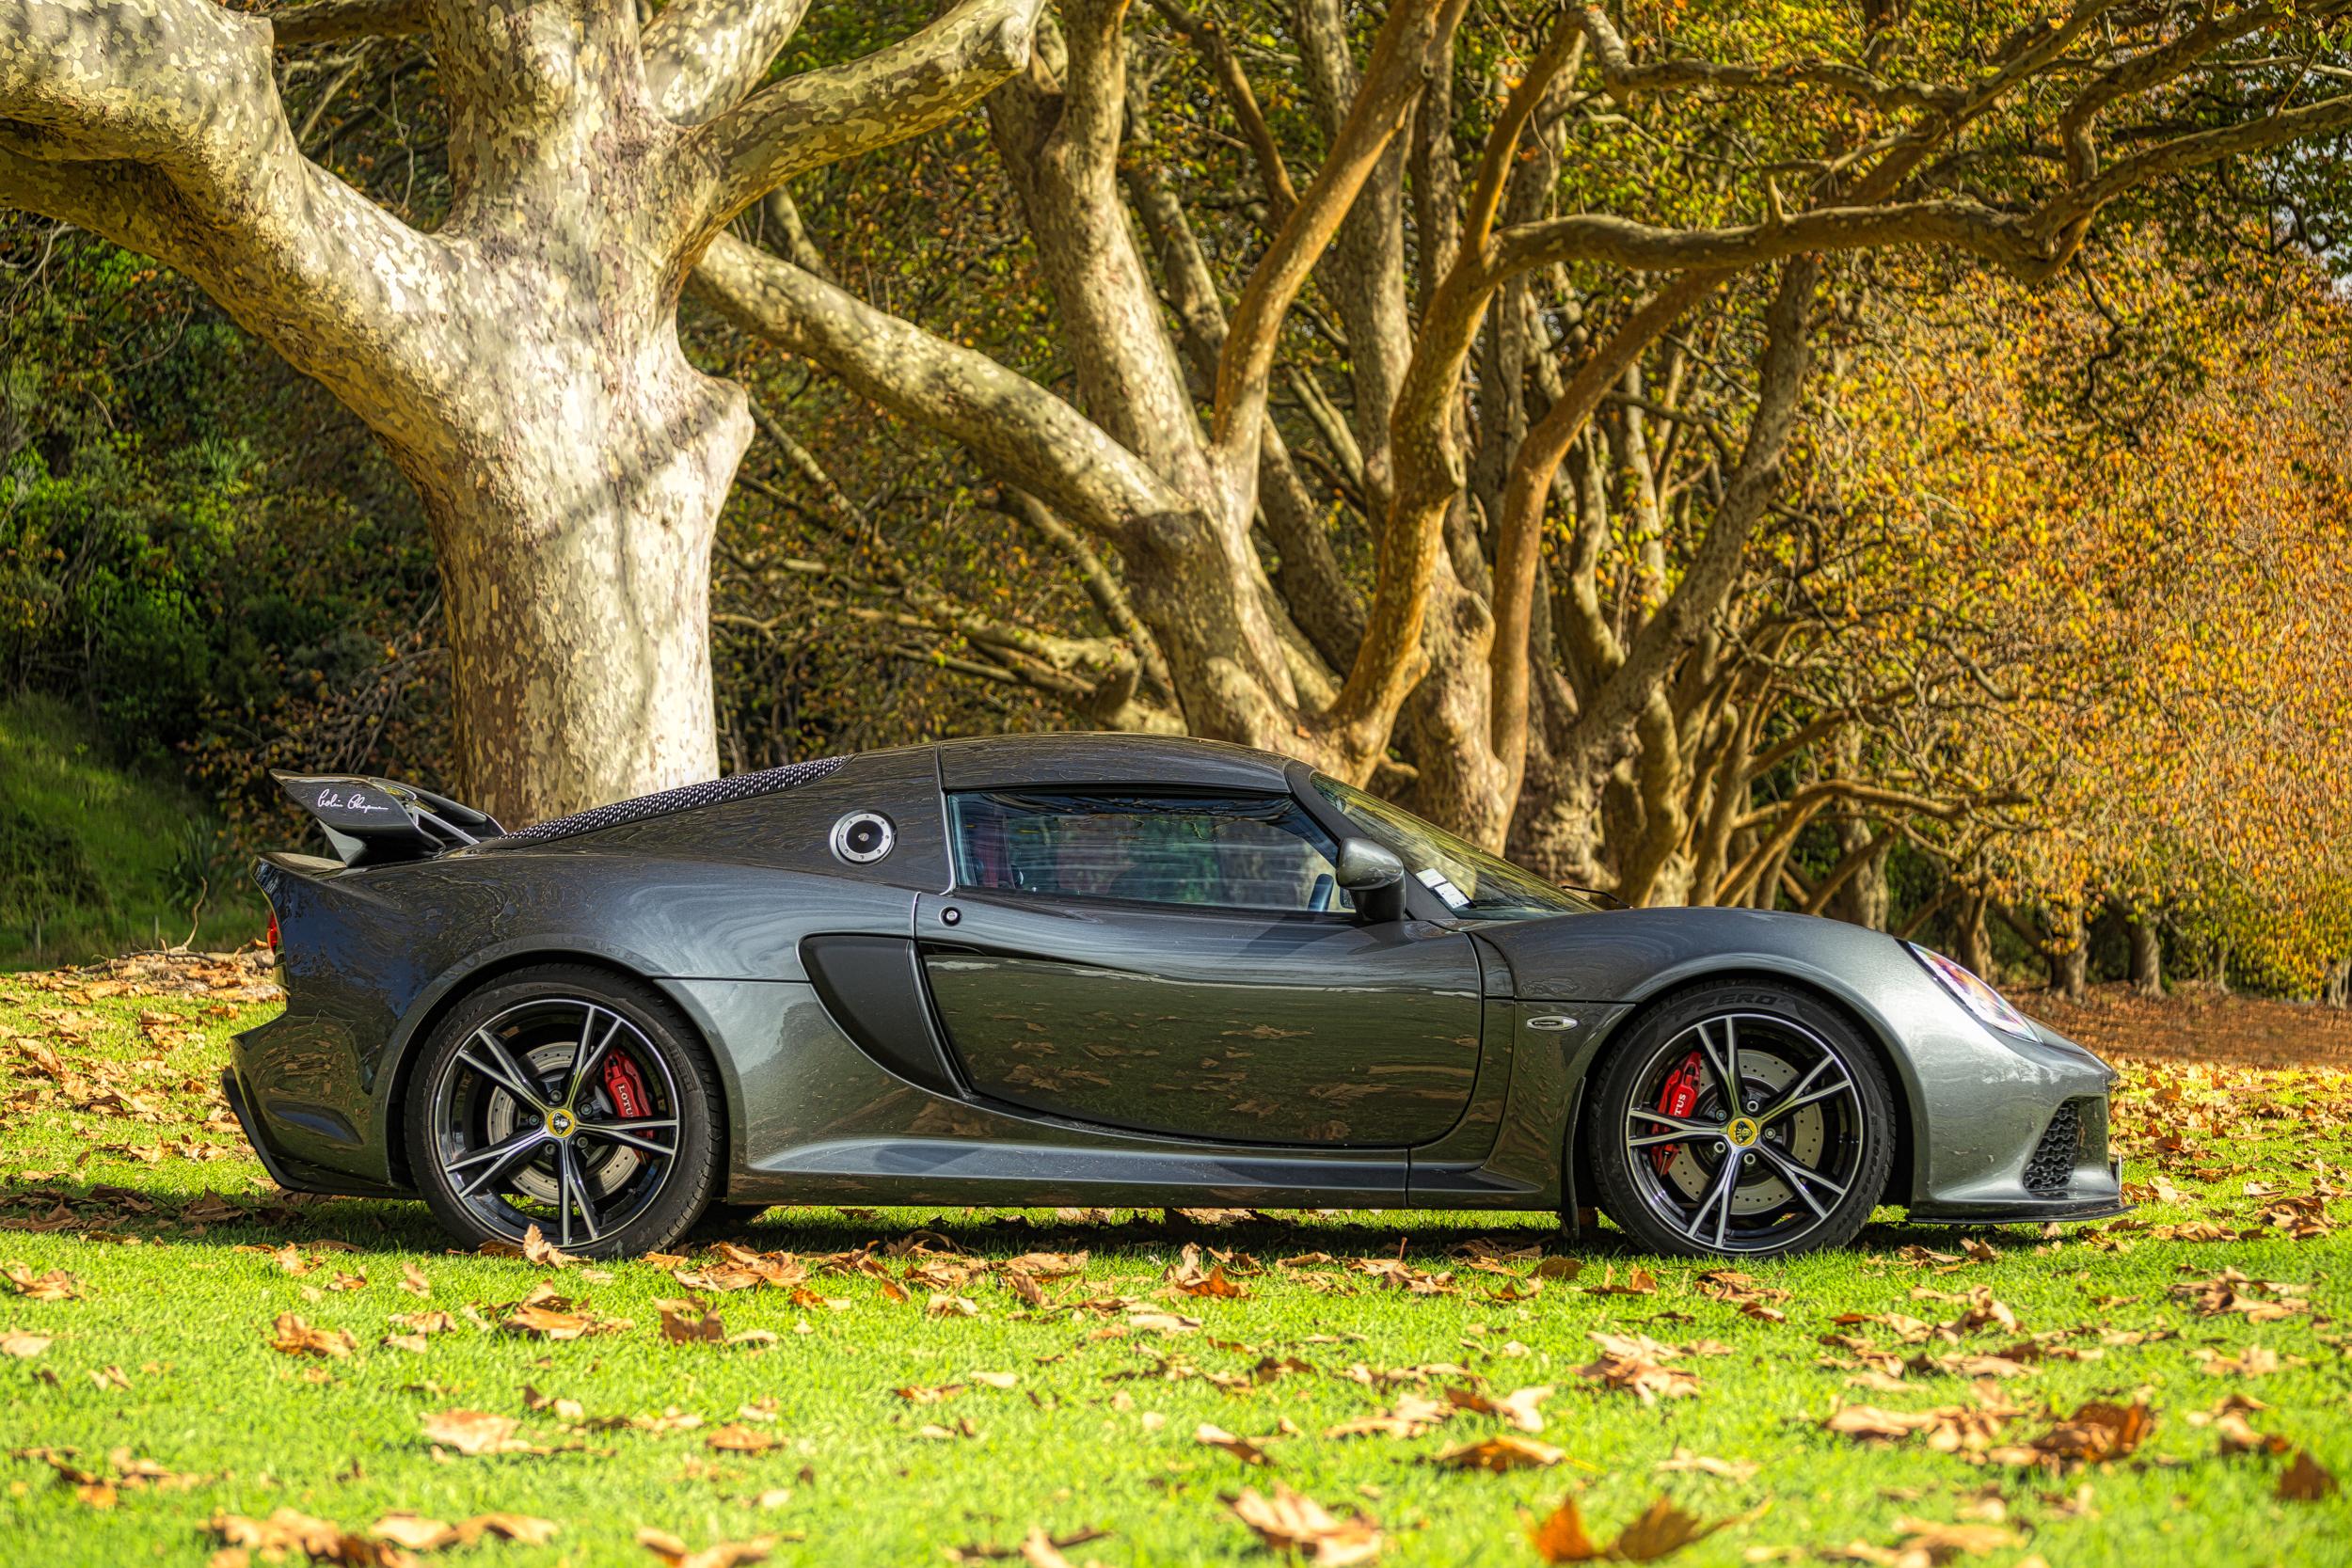 Lotus-camleggettphoto-3.jpg